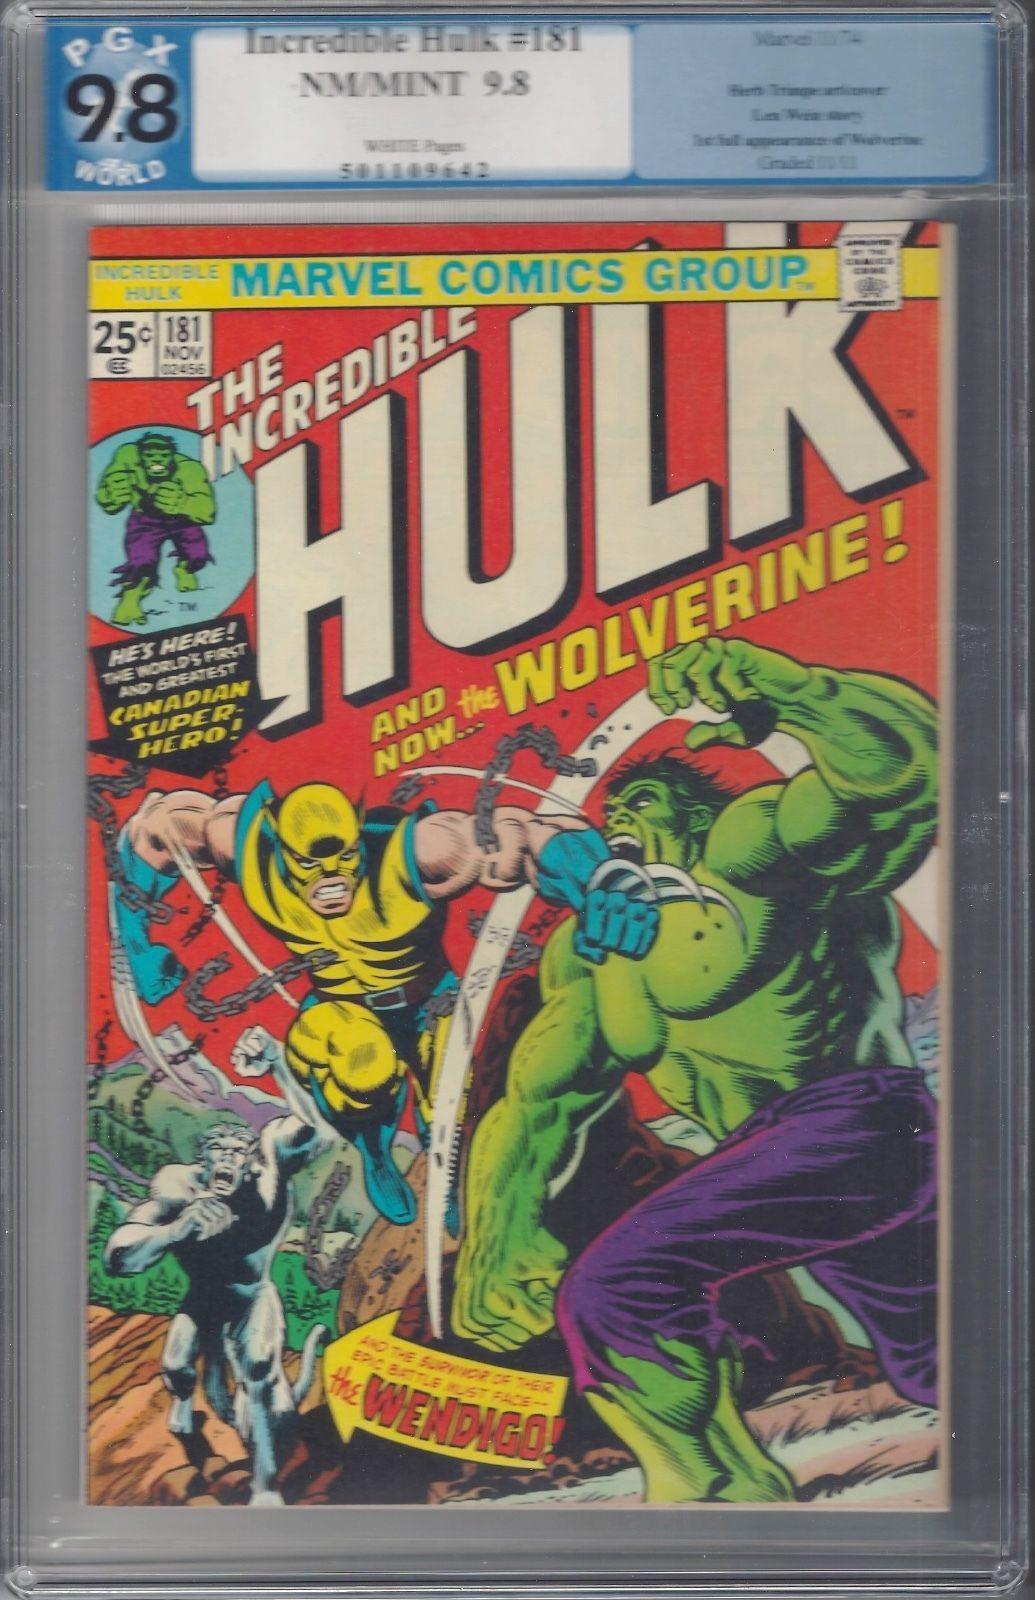 archived! $ 9359   Incredible Hulk 181 9.8 Graded Pgx 1st Wolverine. Rare High . #comics #hulk https://t.co/snx7Q8Voak